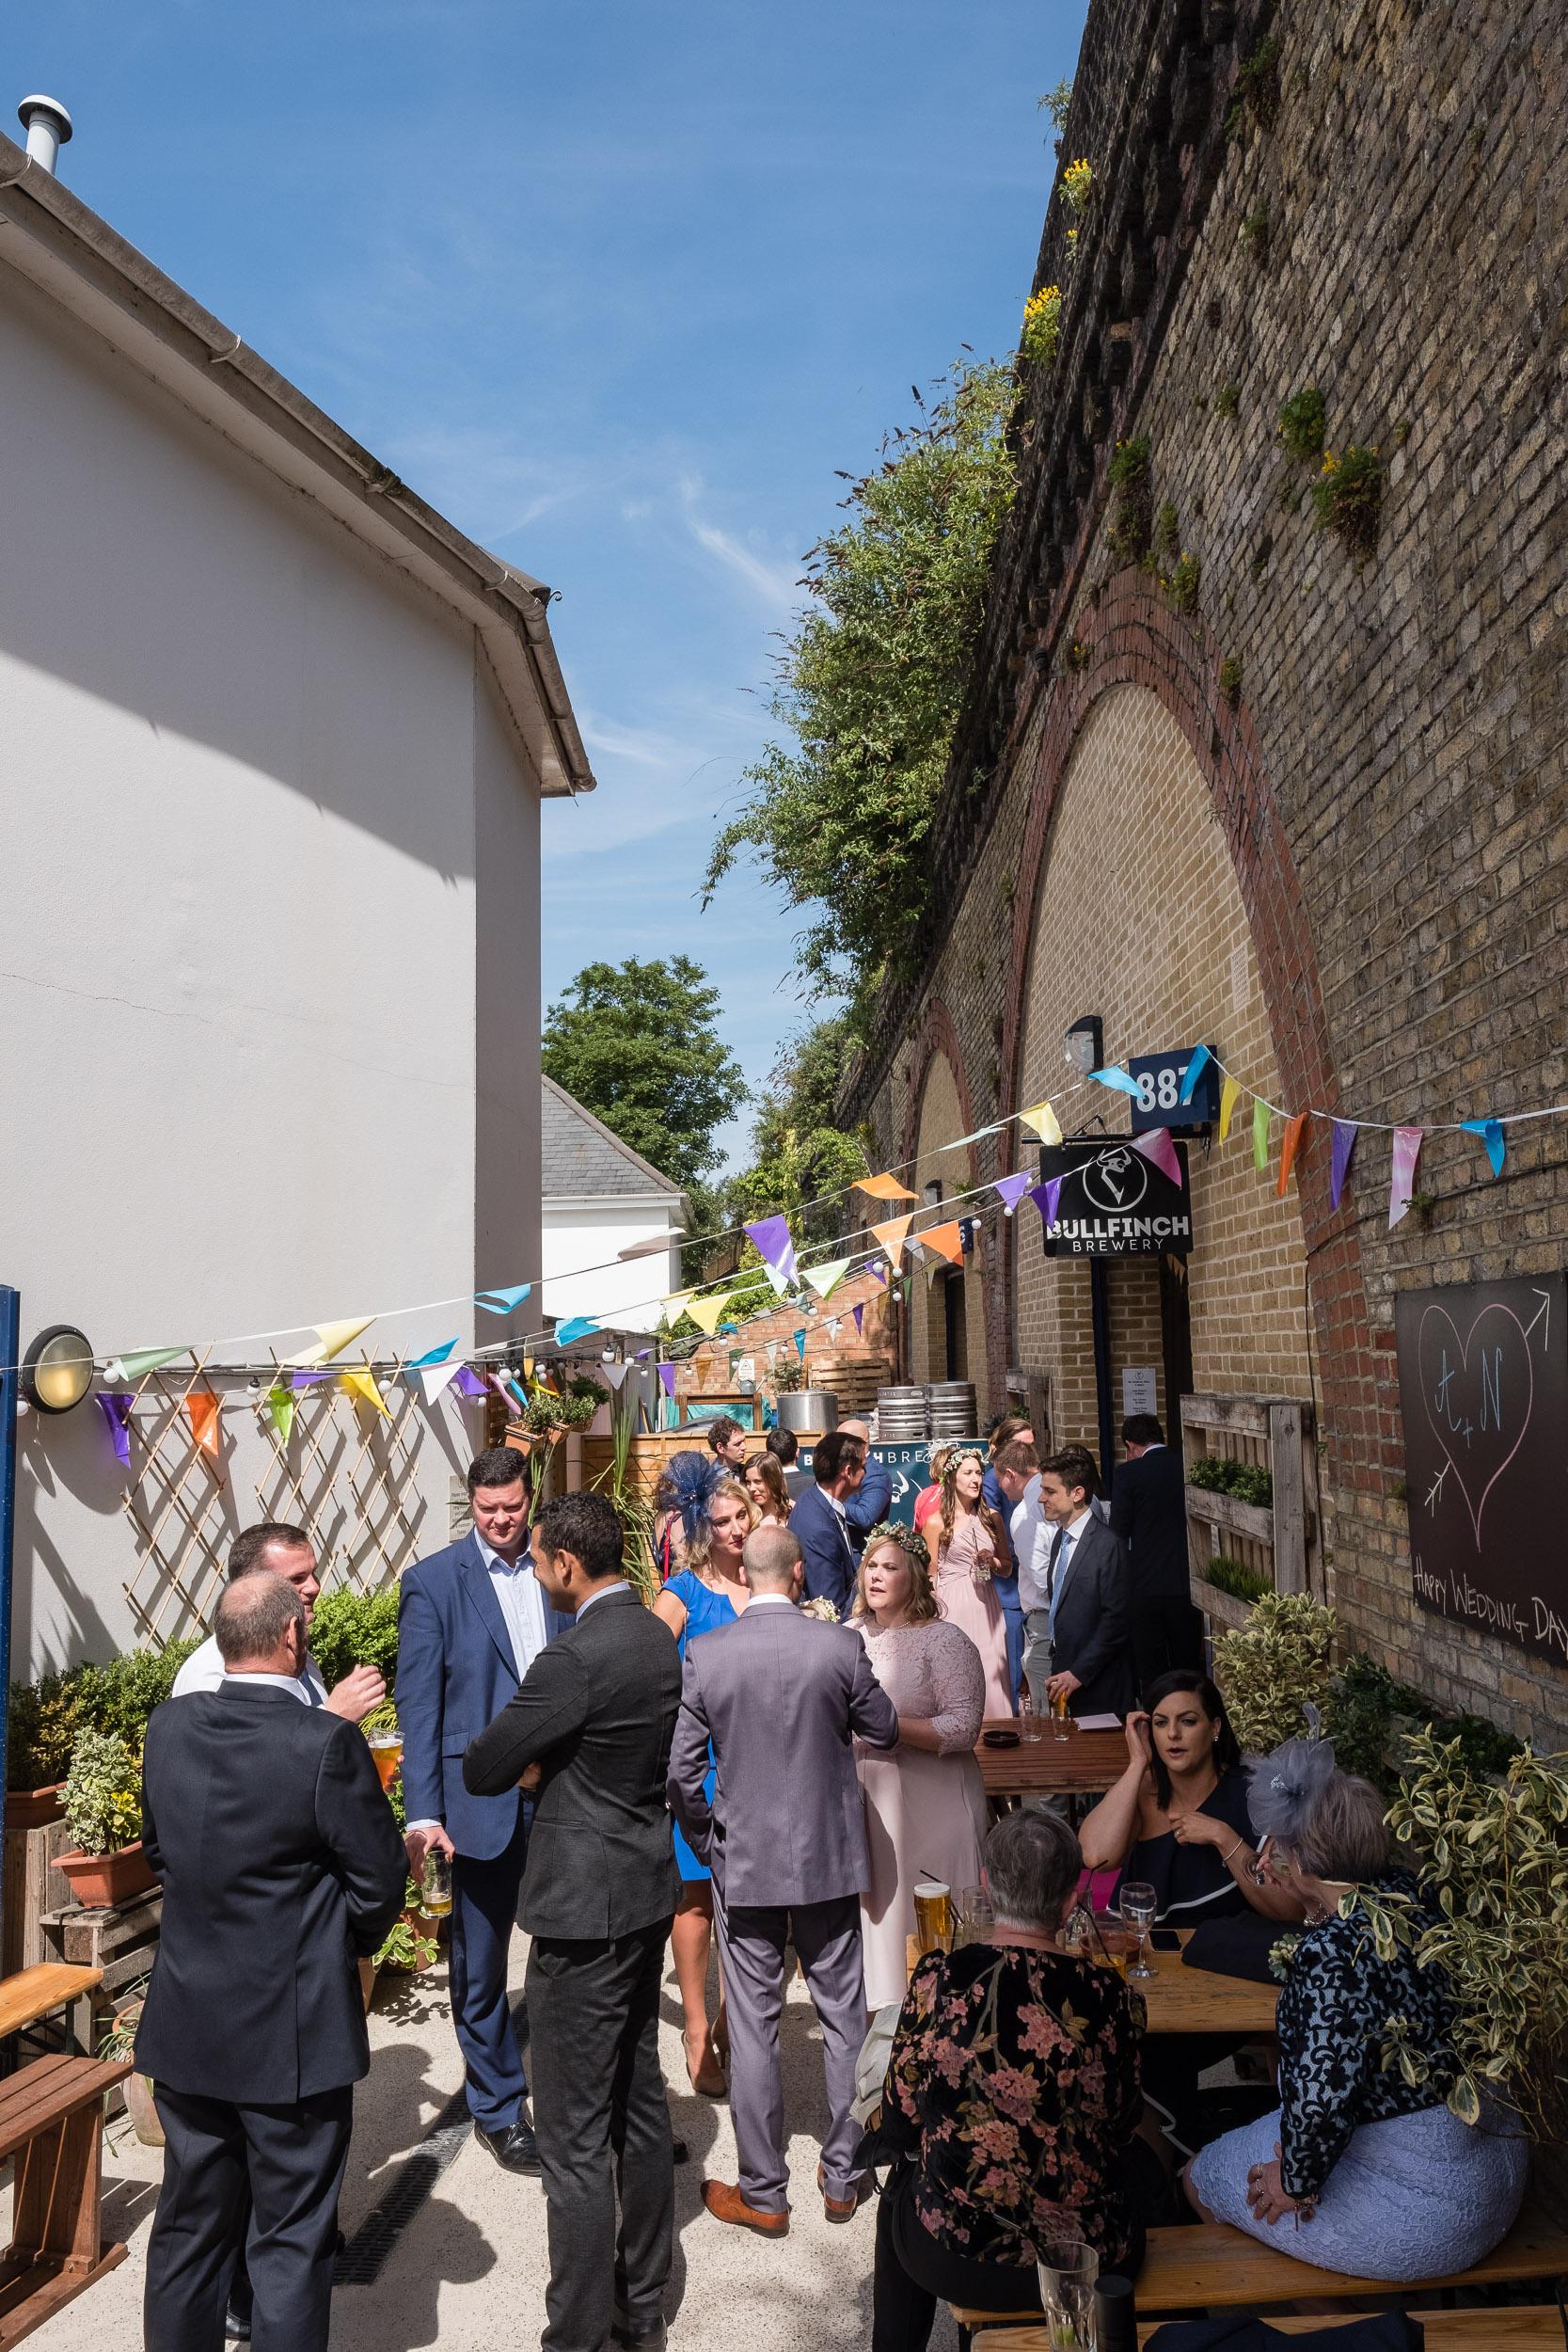 brockwell-lido-brixton-herne-hill-wedding-093.jpg